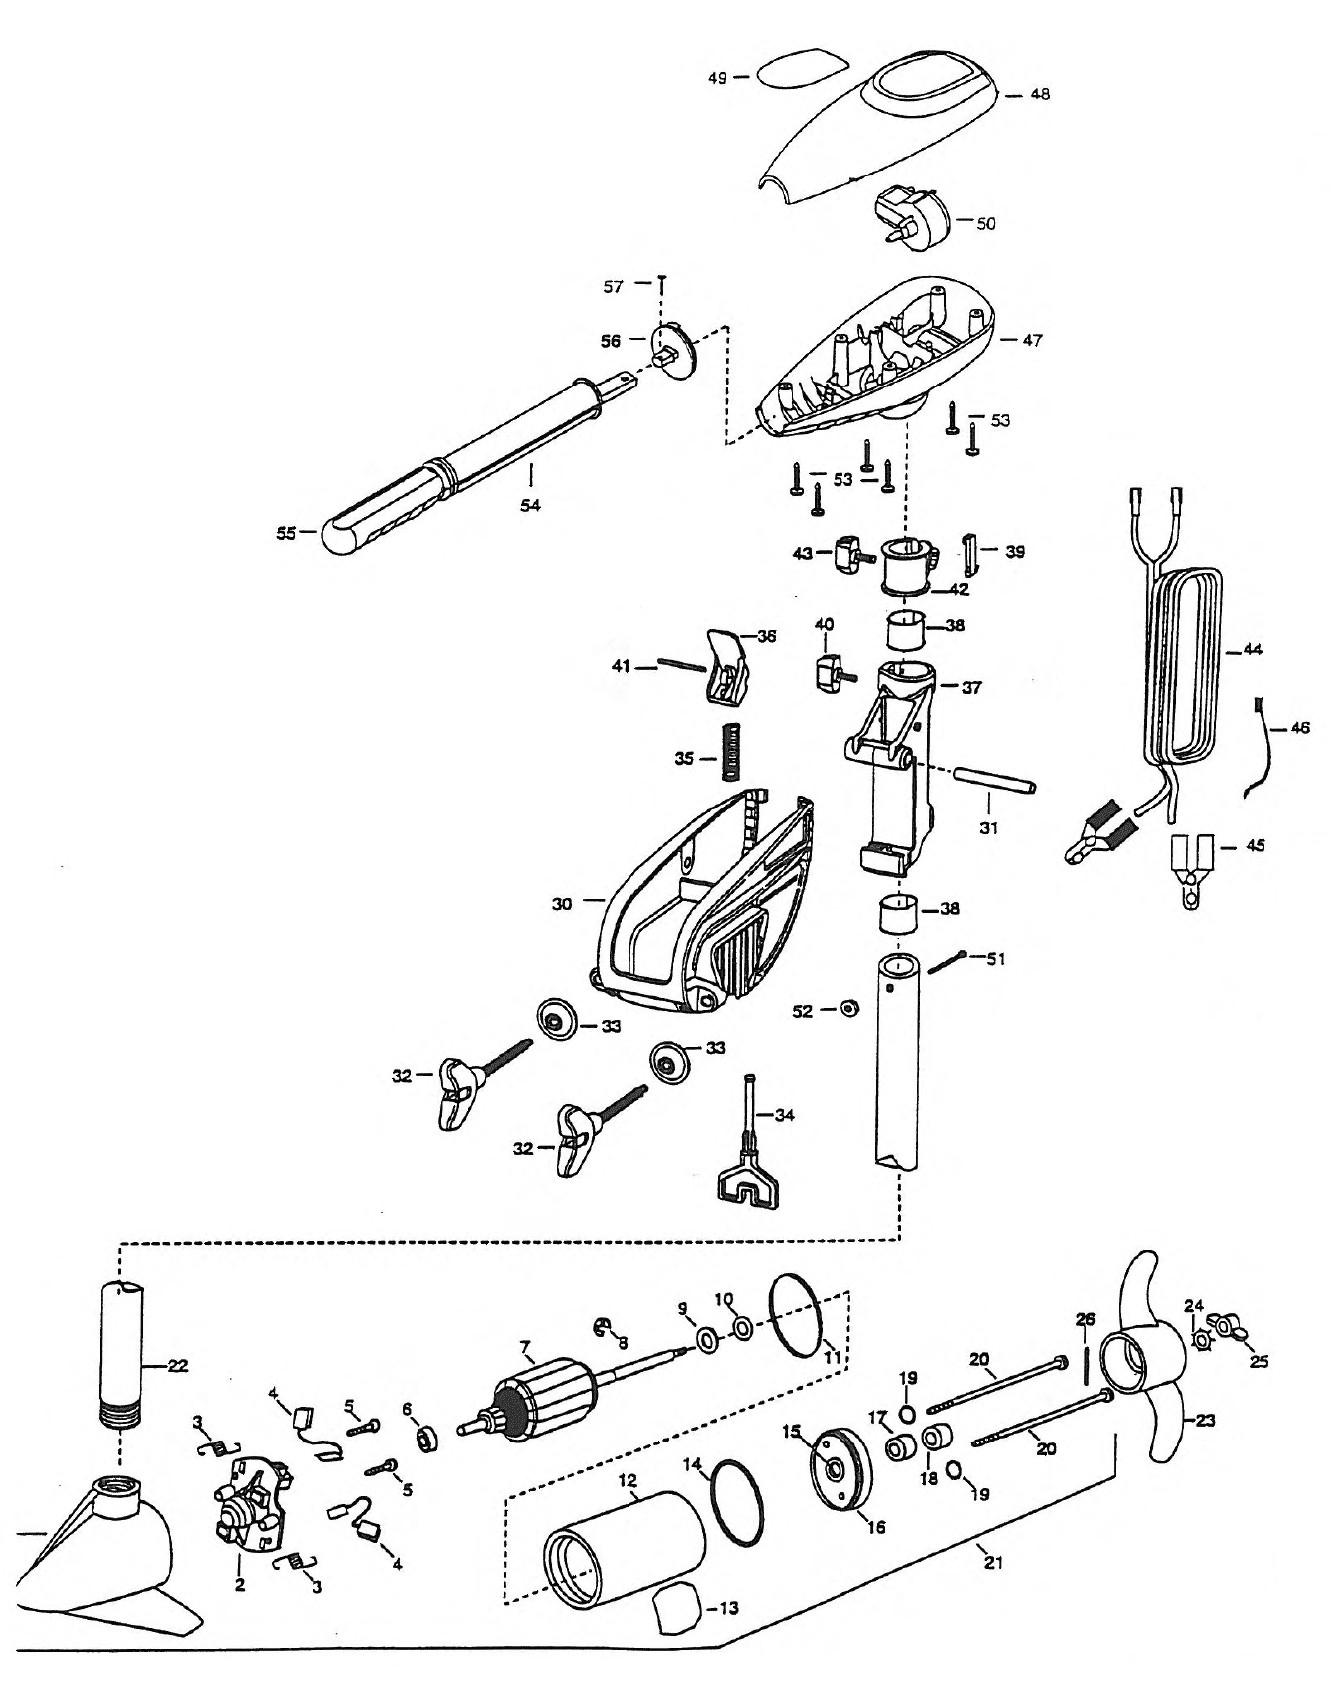 hight resolution of minn kota powerdrive wiring diagram wiring diagram technicwiring diagram minn kota power drive 55 i pilot